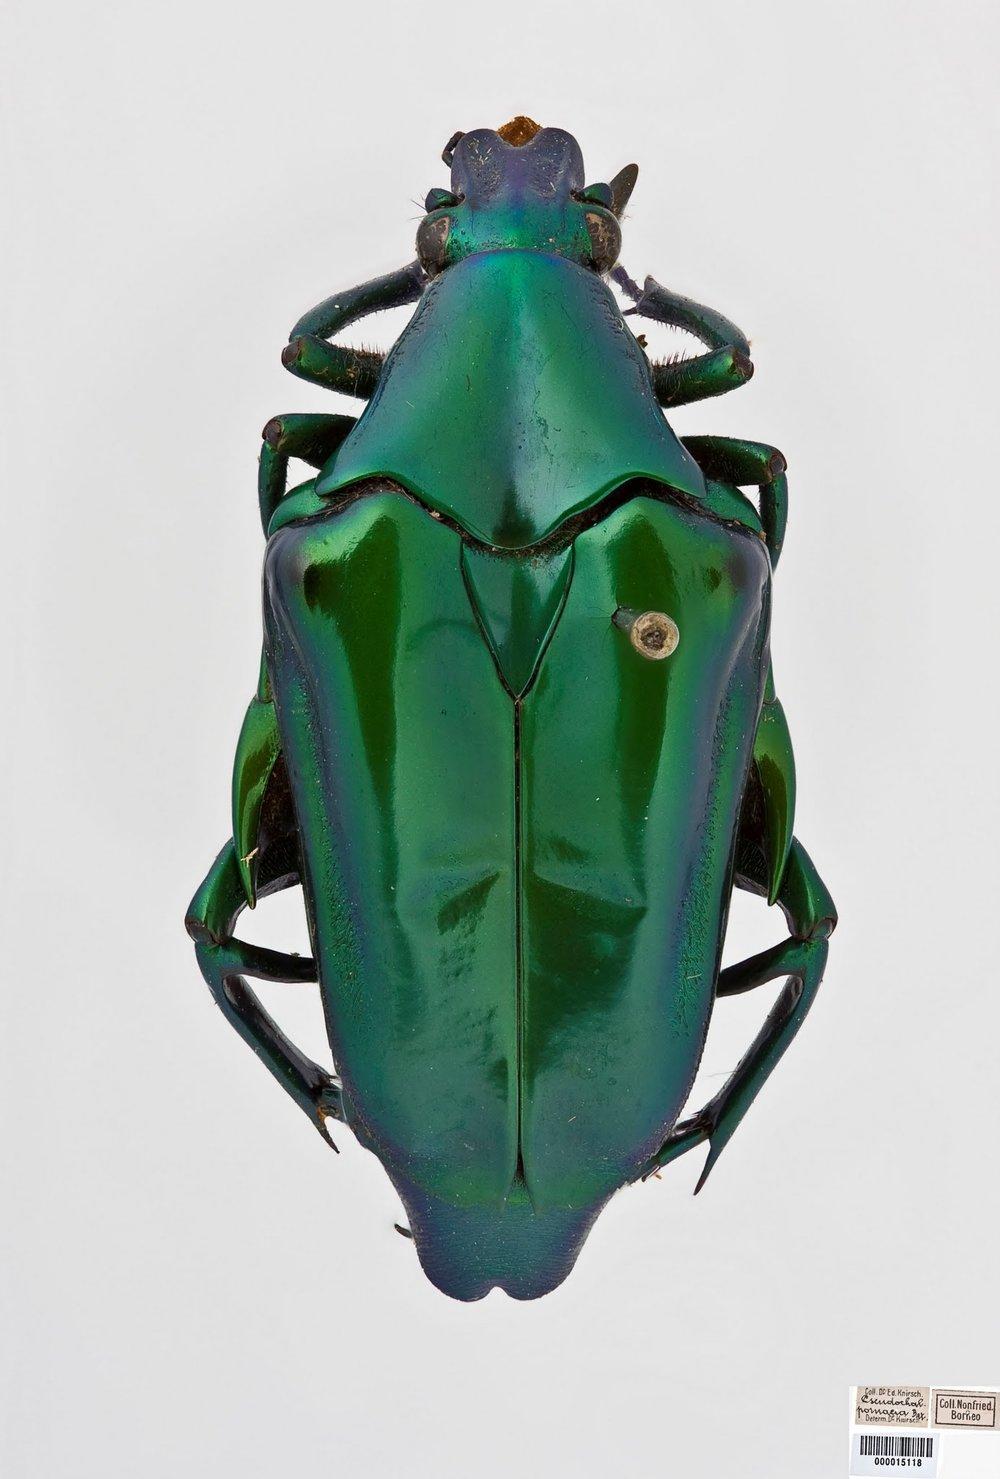 Pseudochalcothea auripos copy.jpg